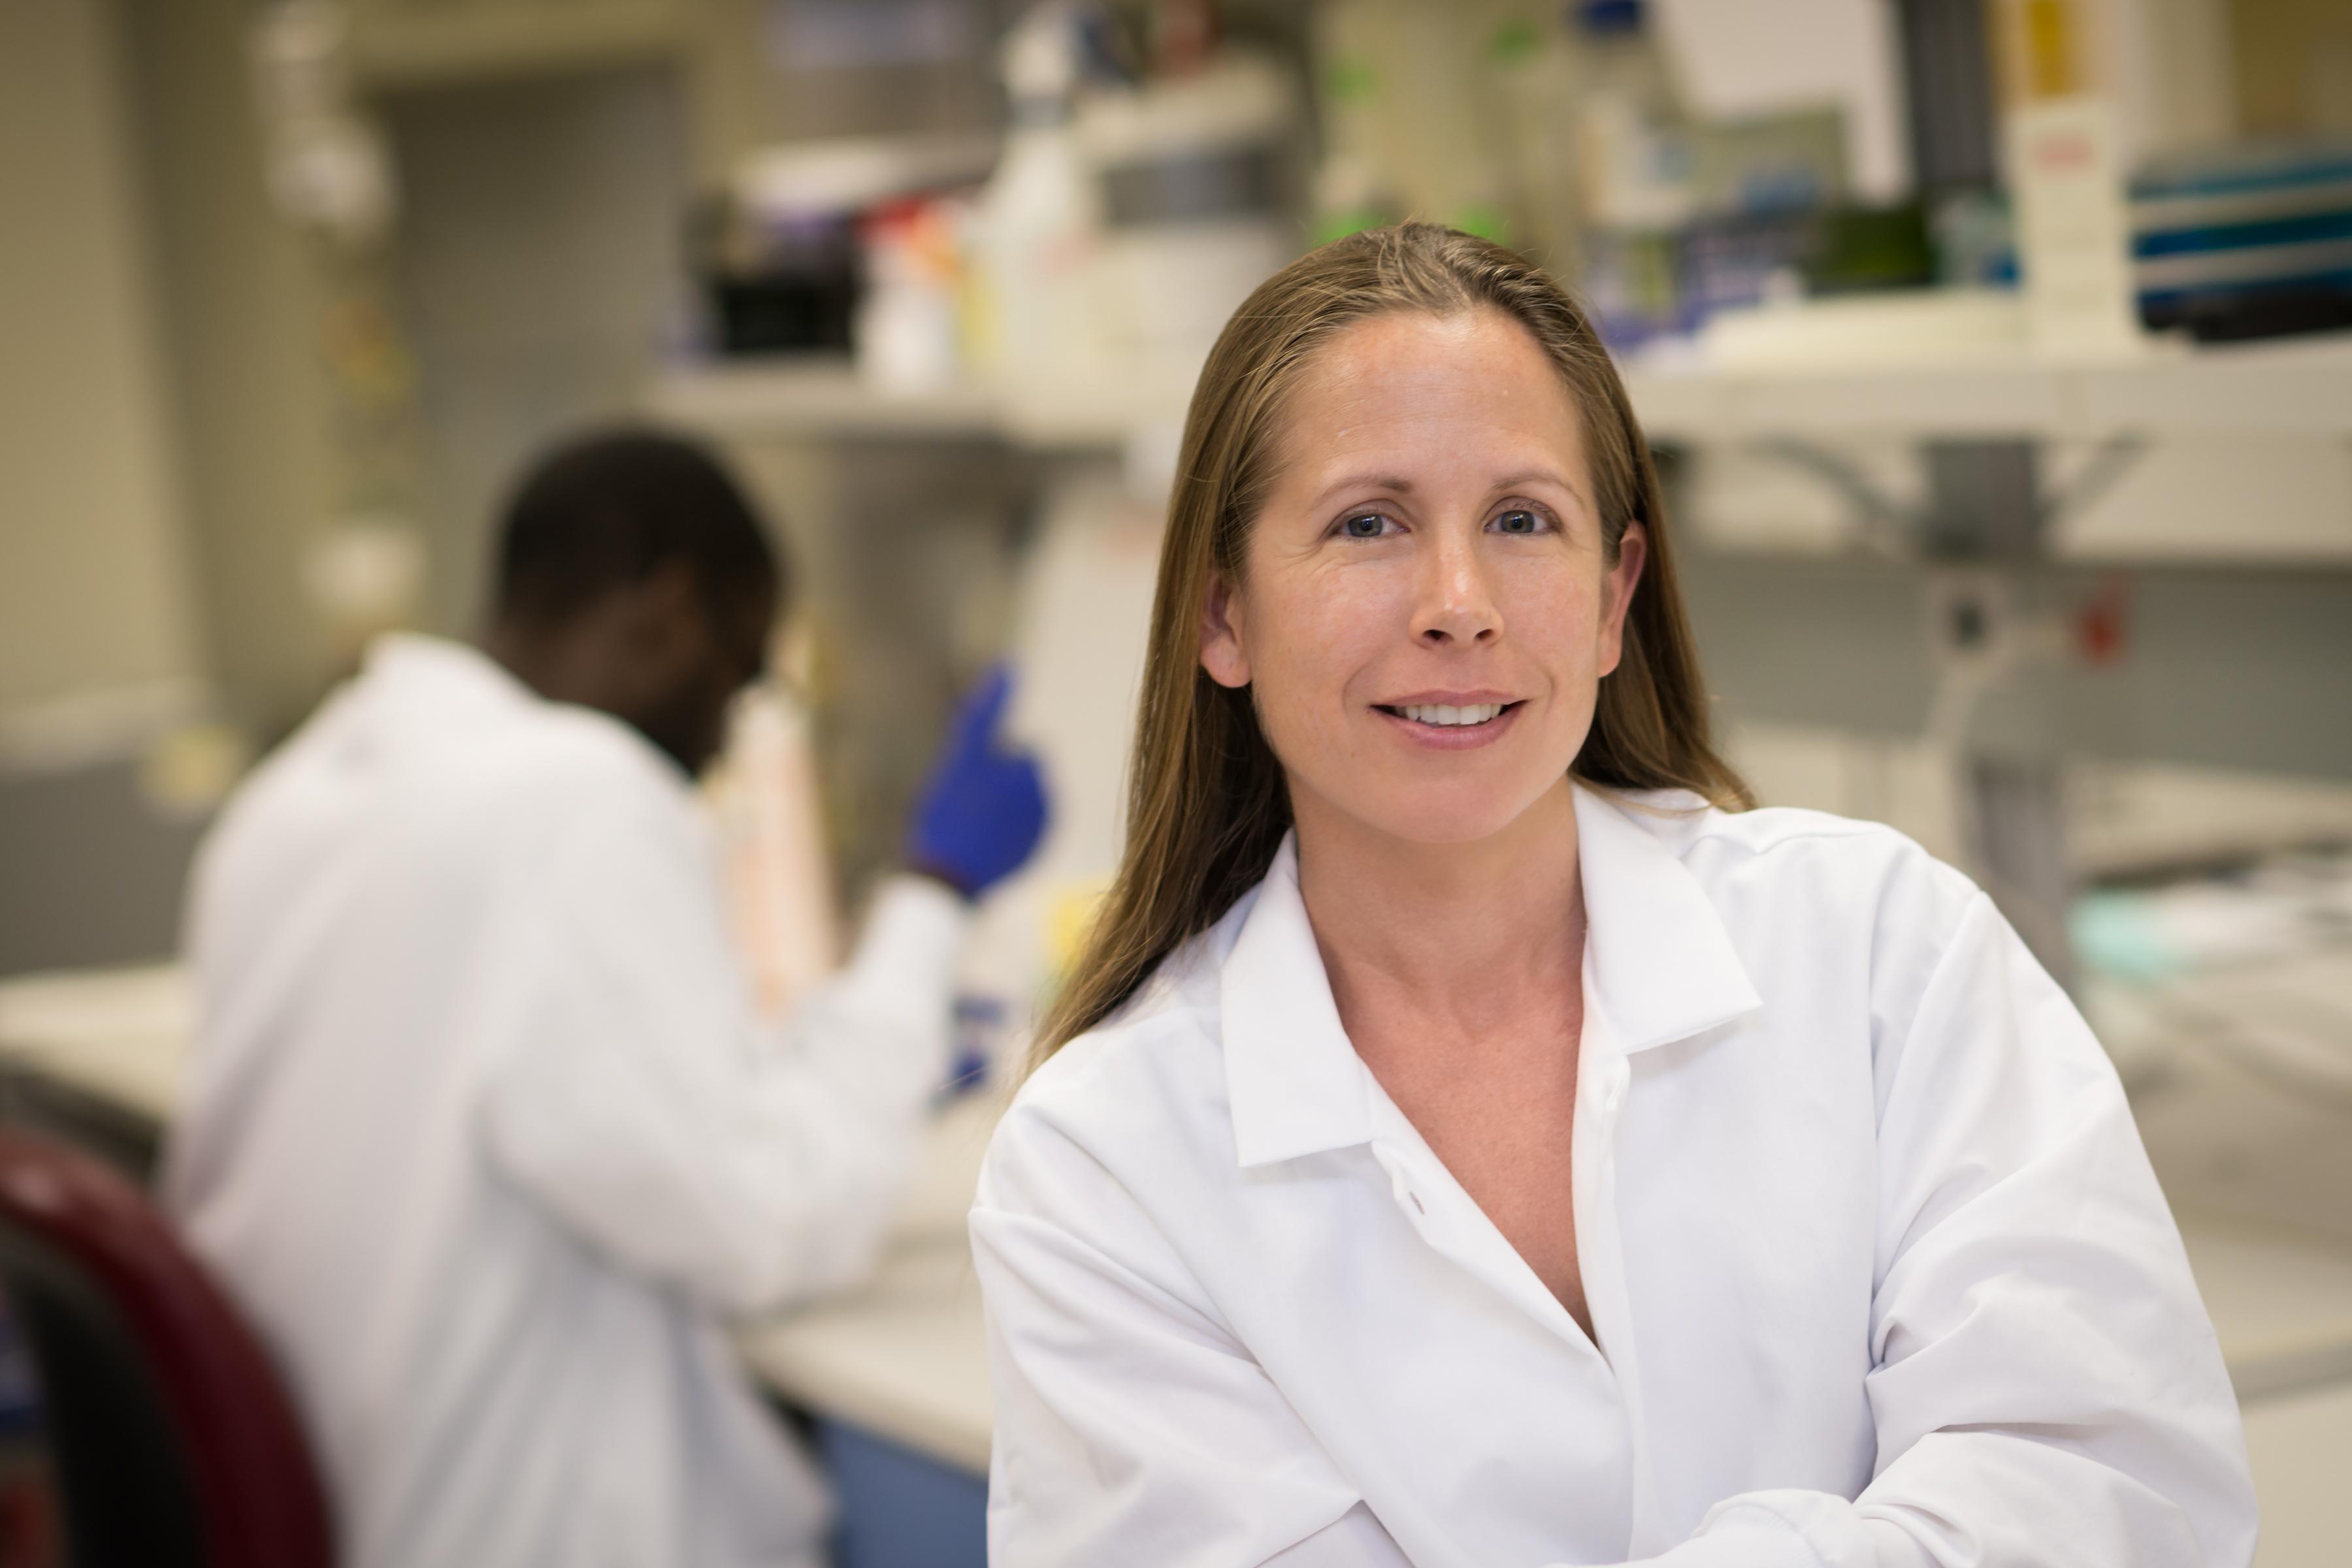 Portrait of Dr. Kelly Baker in her lab